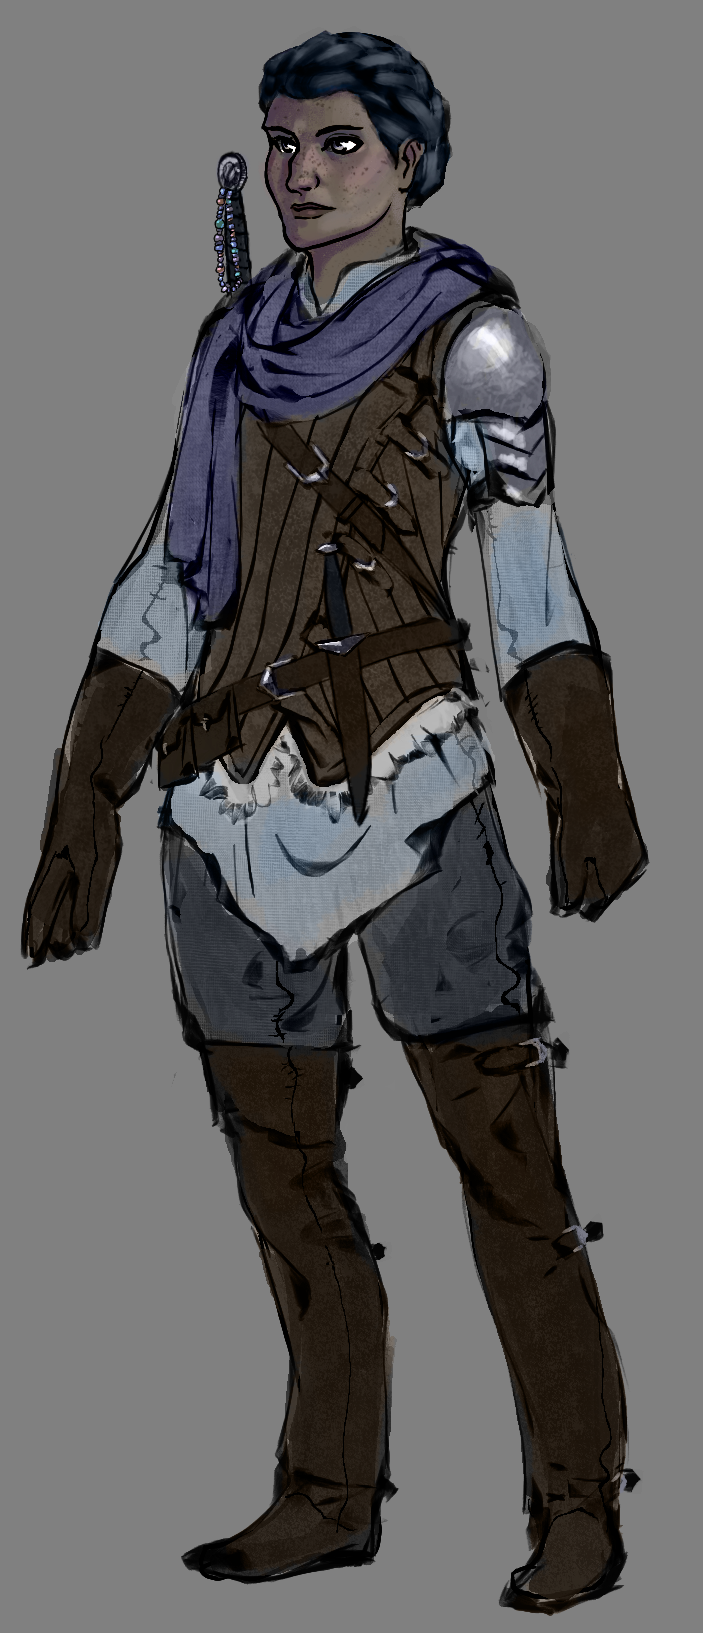 Character Design Krita : Vaia costume design by rsek on deviantart